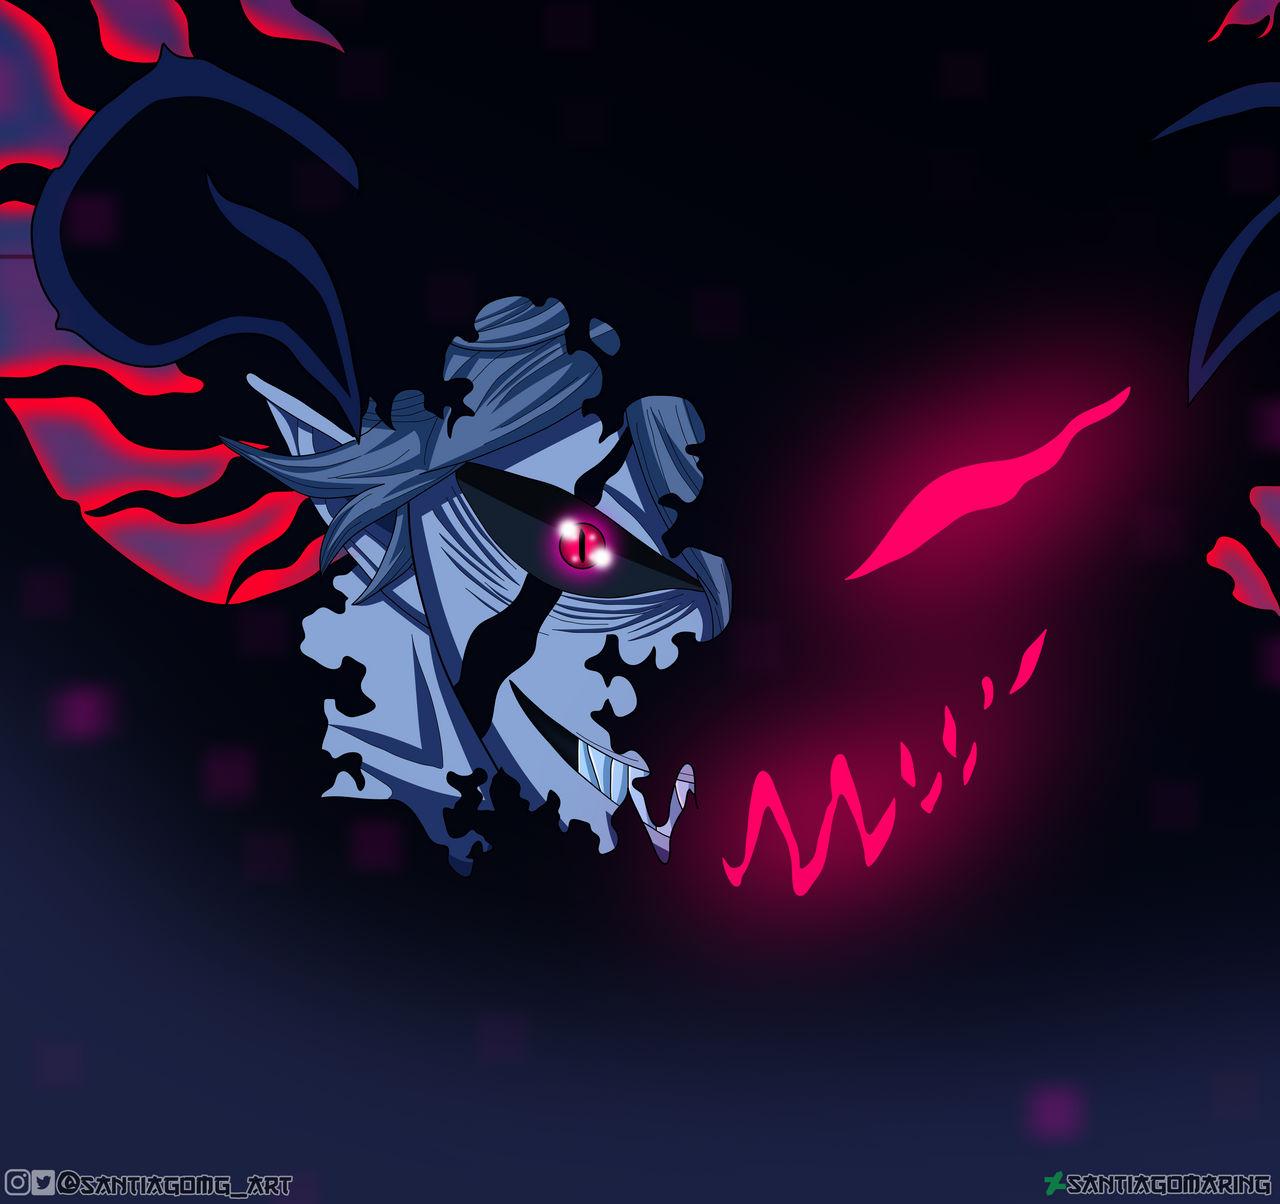 Black Clover 266 Asta Demon Form By Santiagomaring On Deviantart